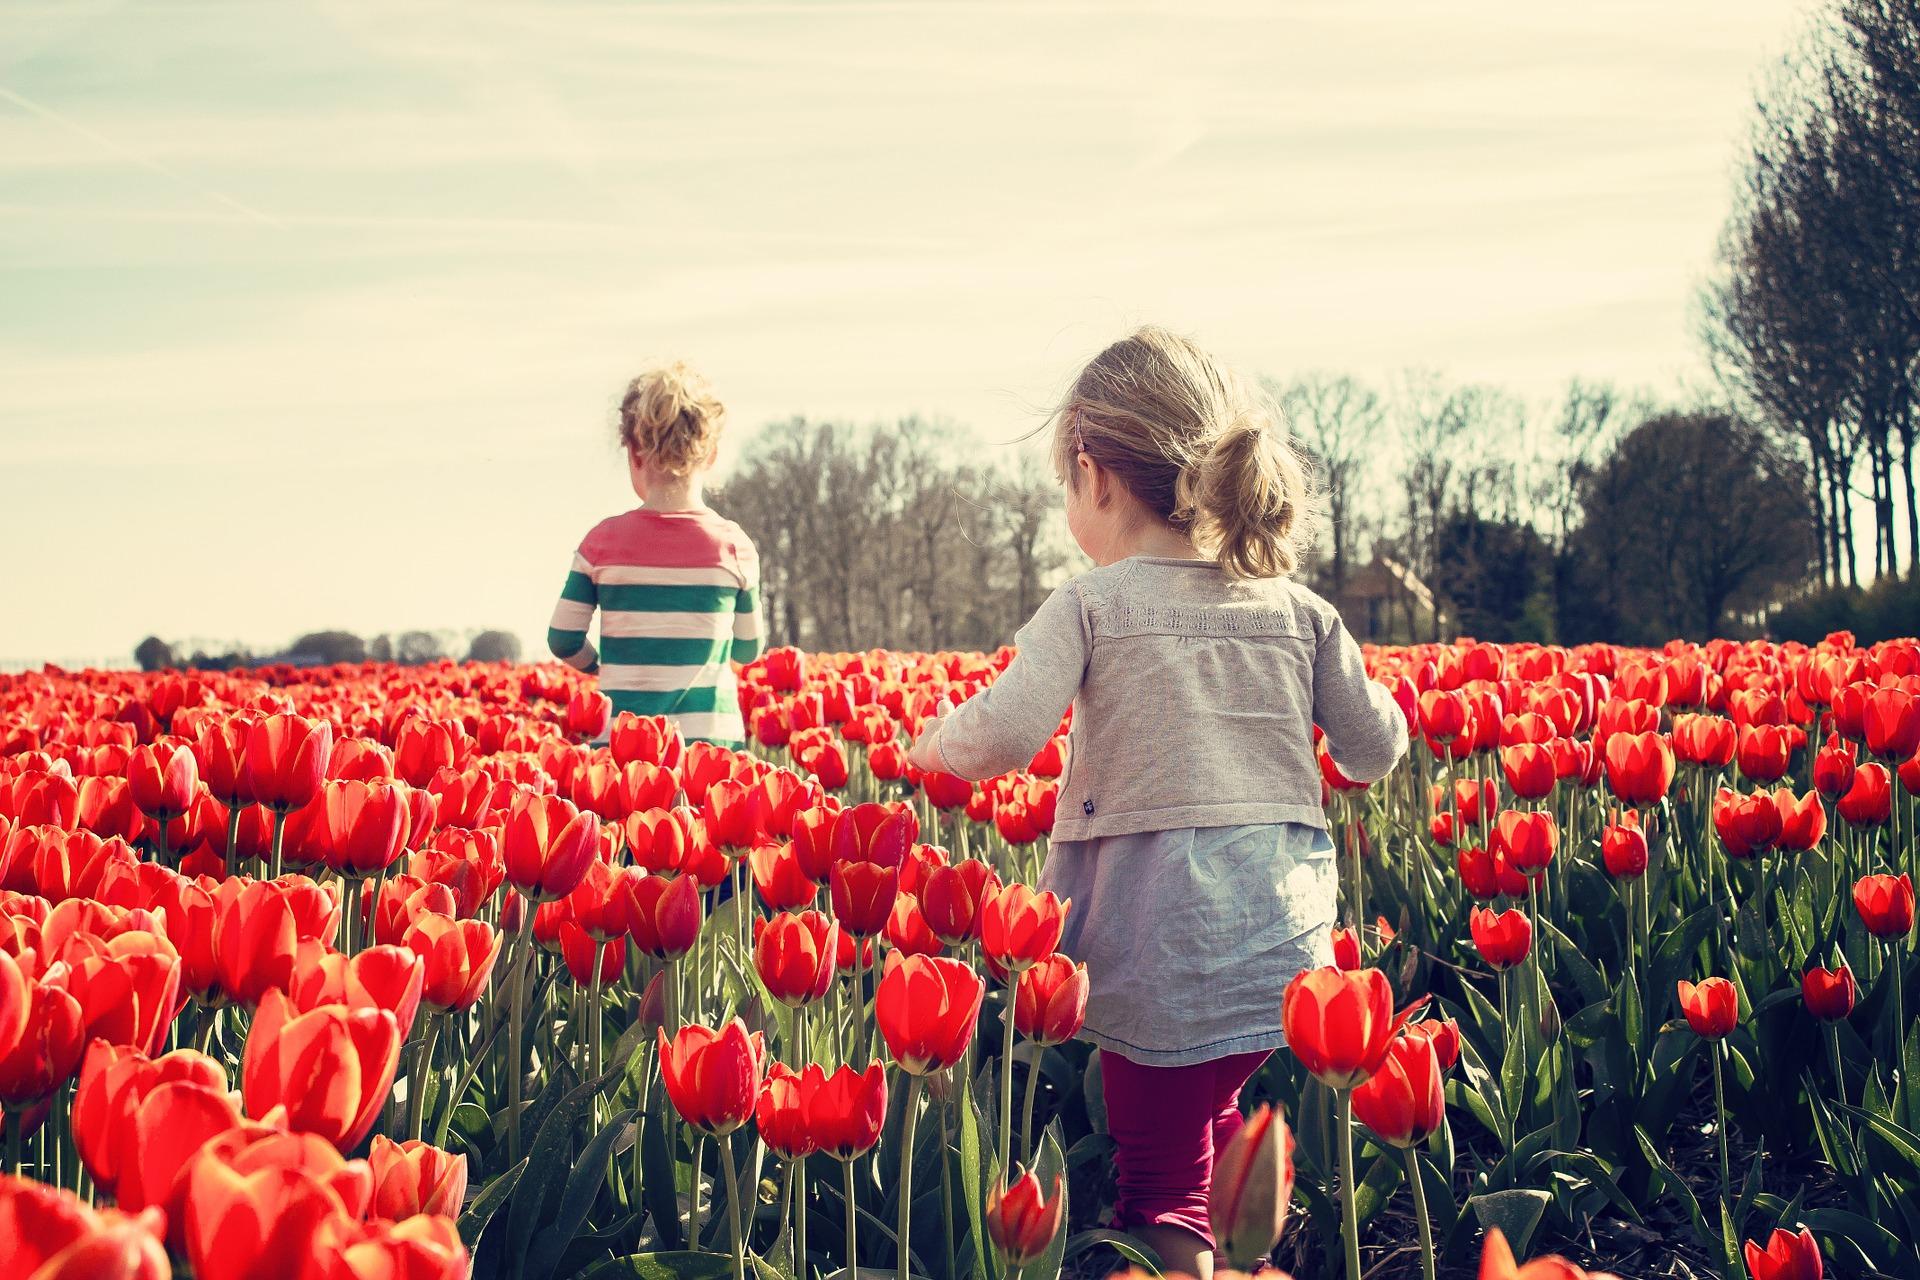 Nizozemska, kraljica tulipanov